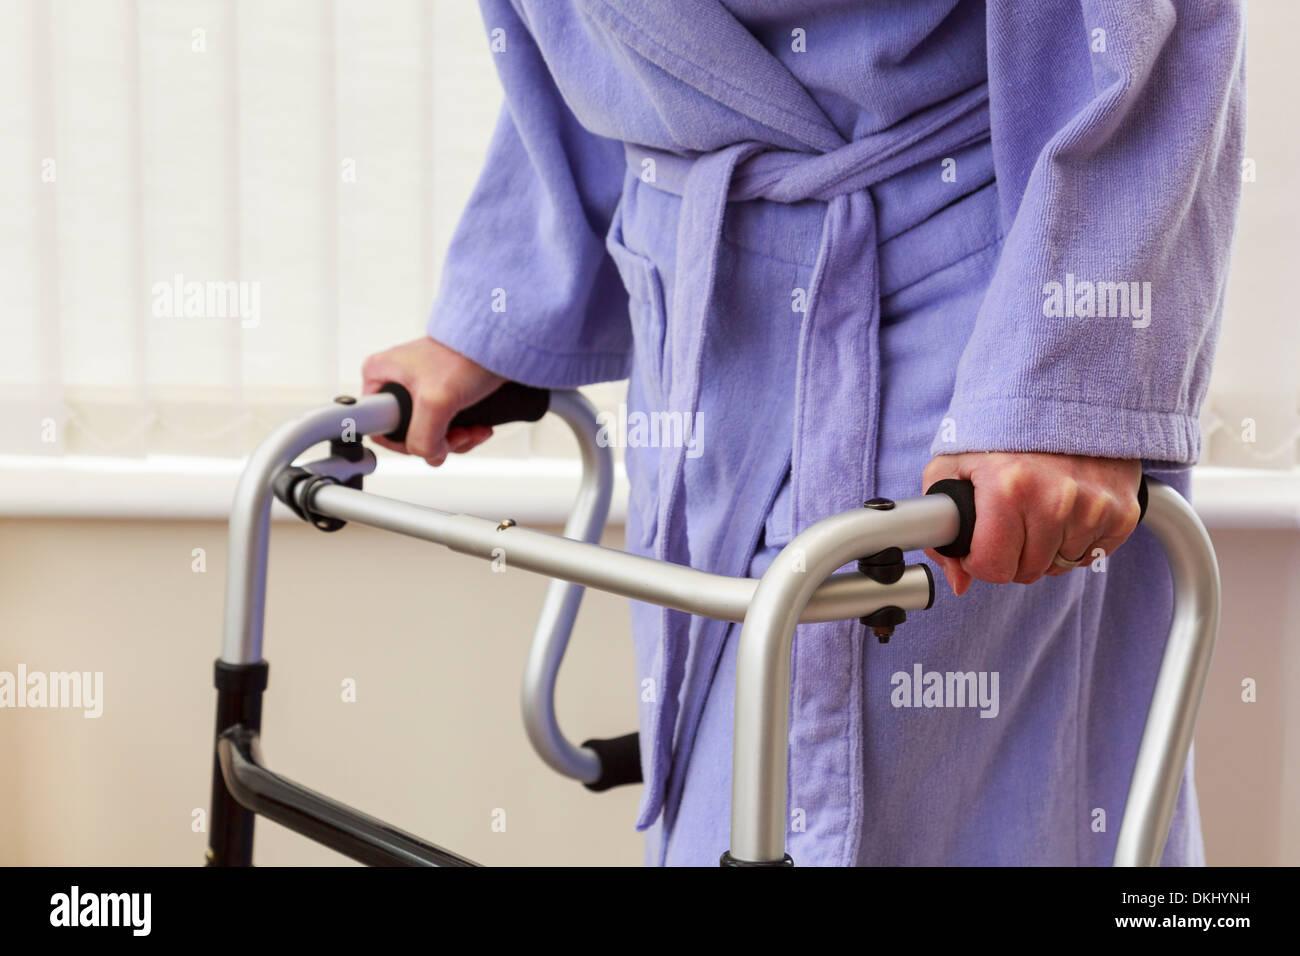 elderly senior woman older person wearing a bathrobe using a zimmer frame walker or support trolley - Zimmer Frame